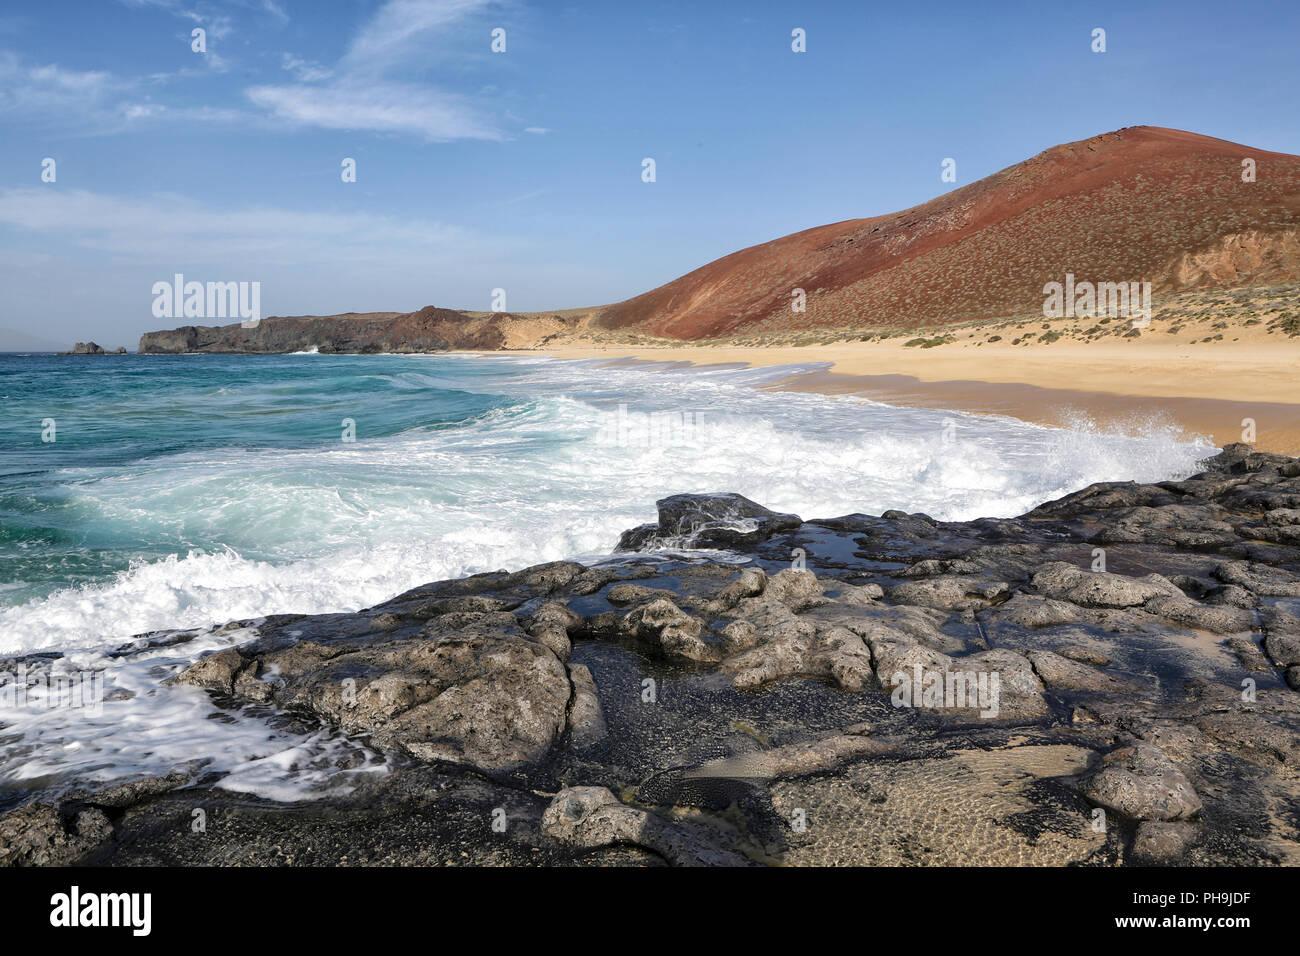 playa lambra isla canarias - Stock Image